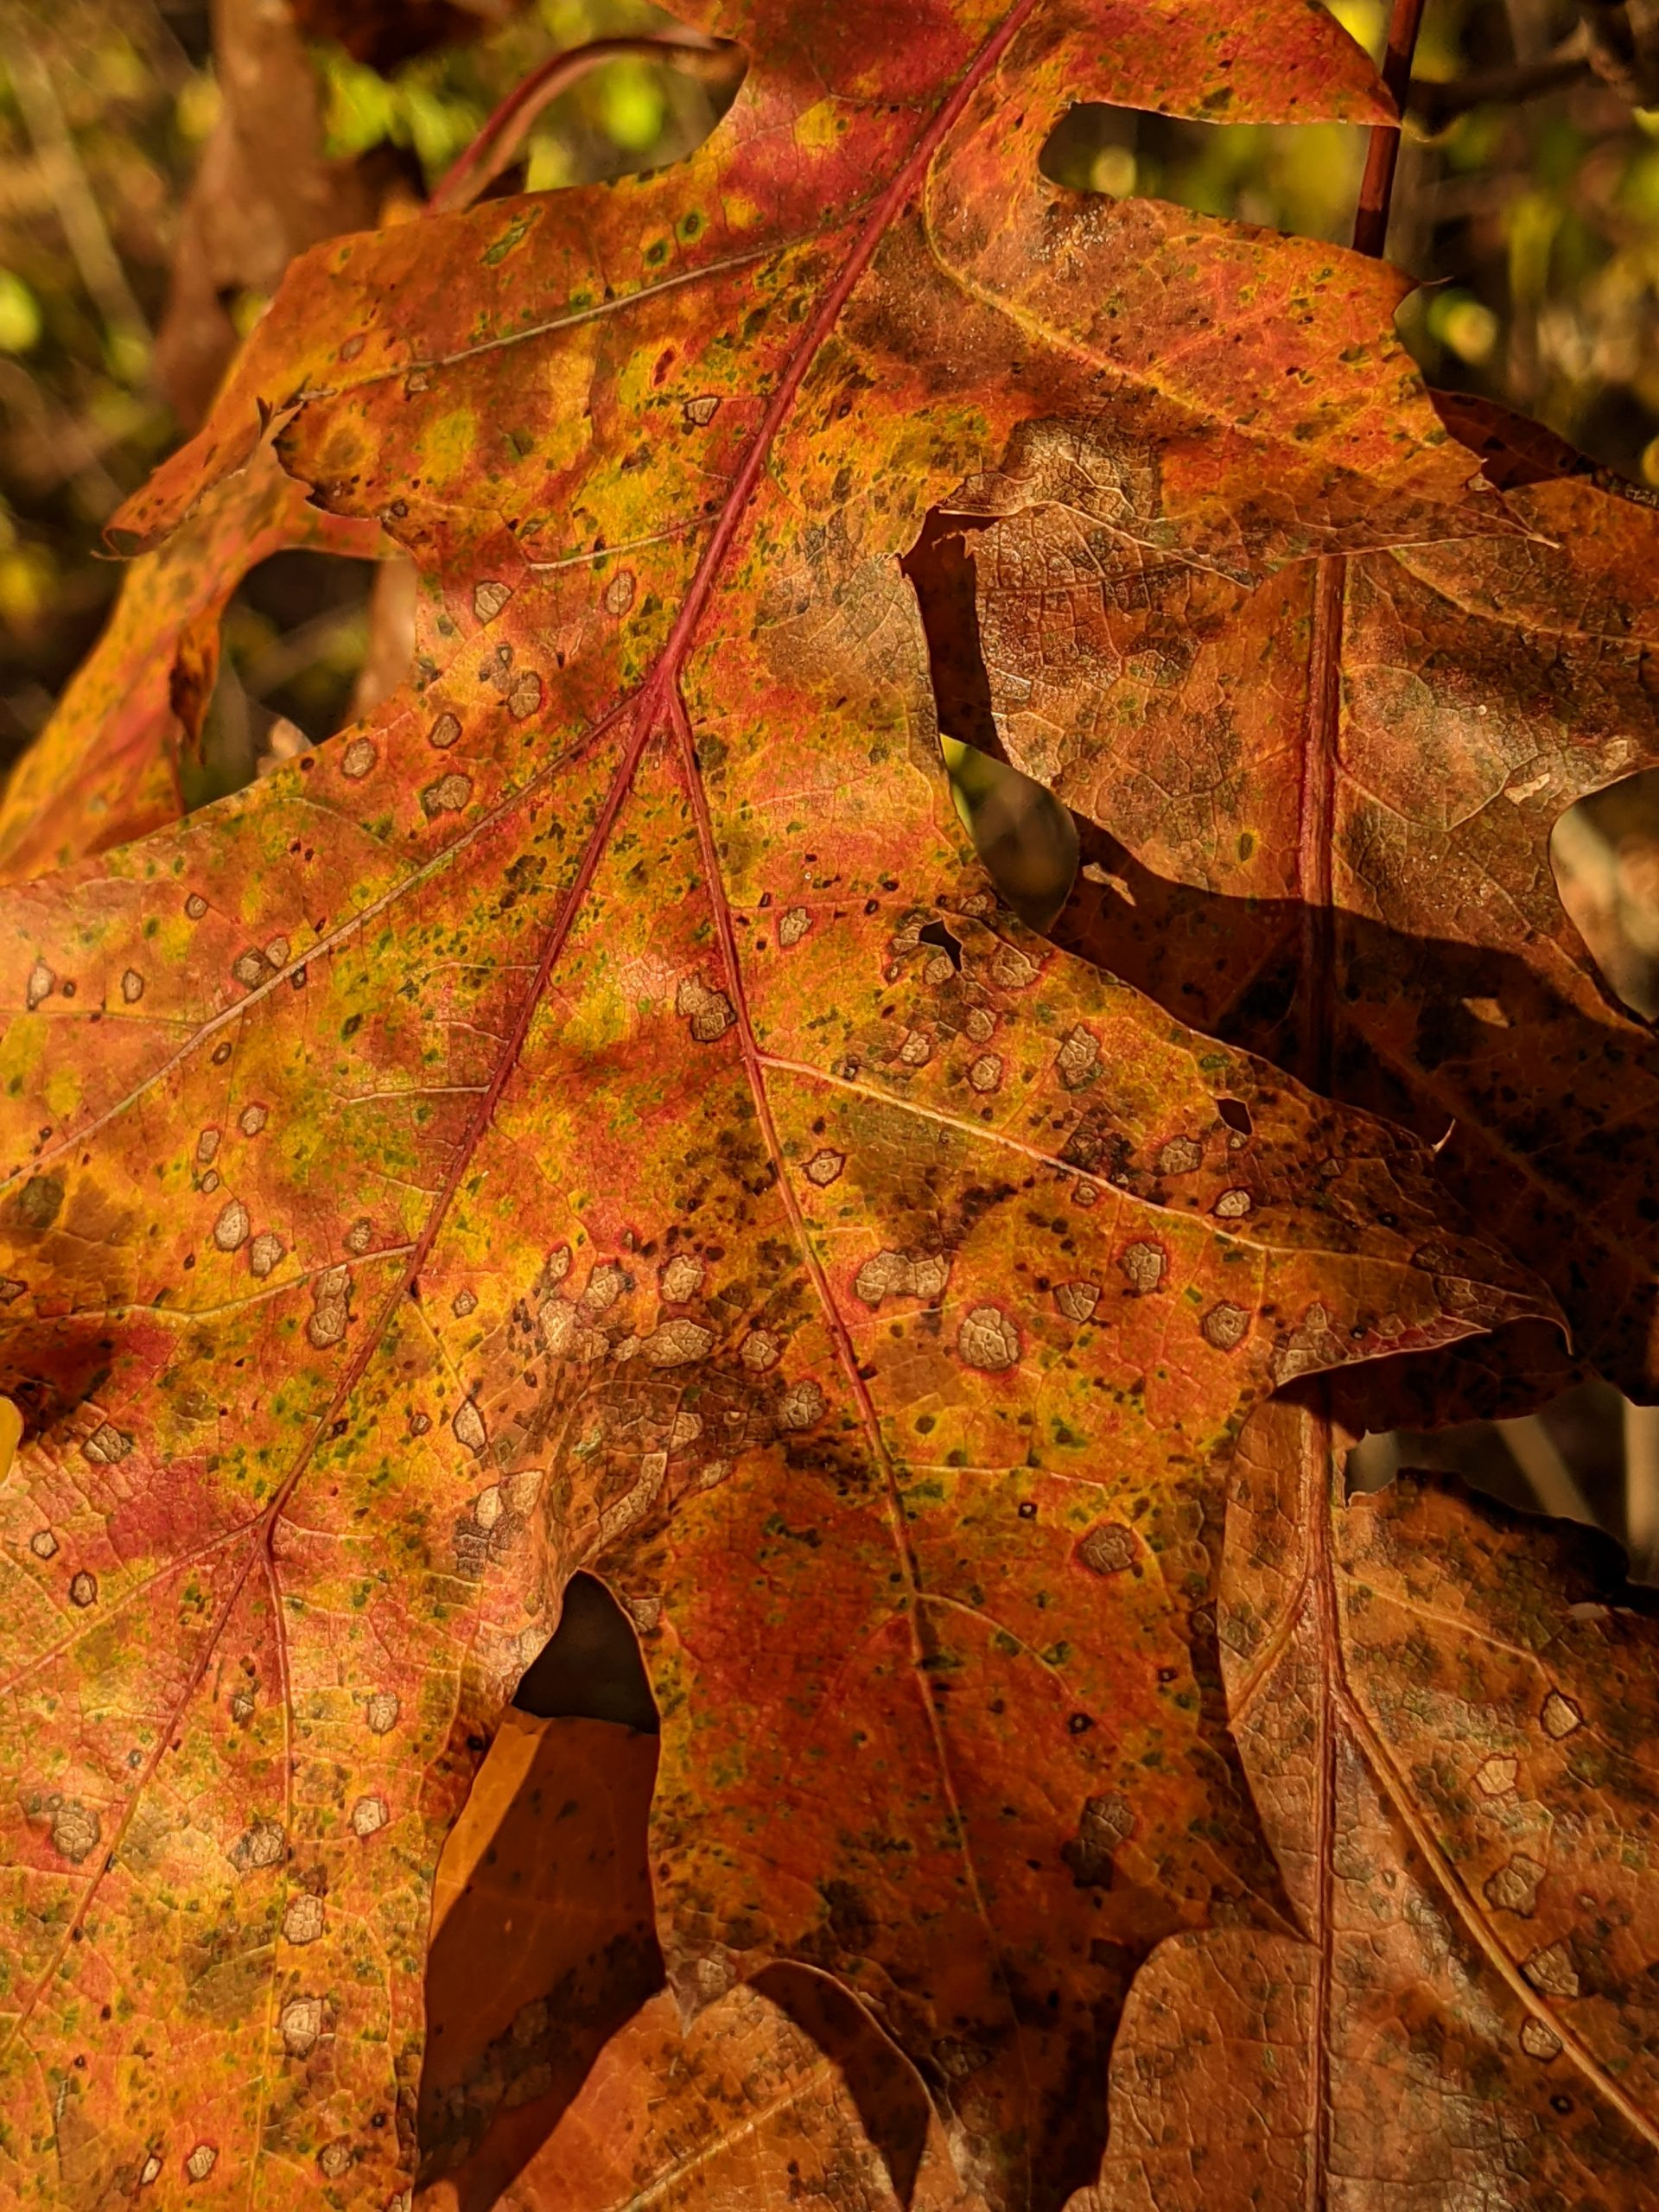 Orange oak leaf fall 2020 - fungus spotted